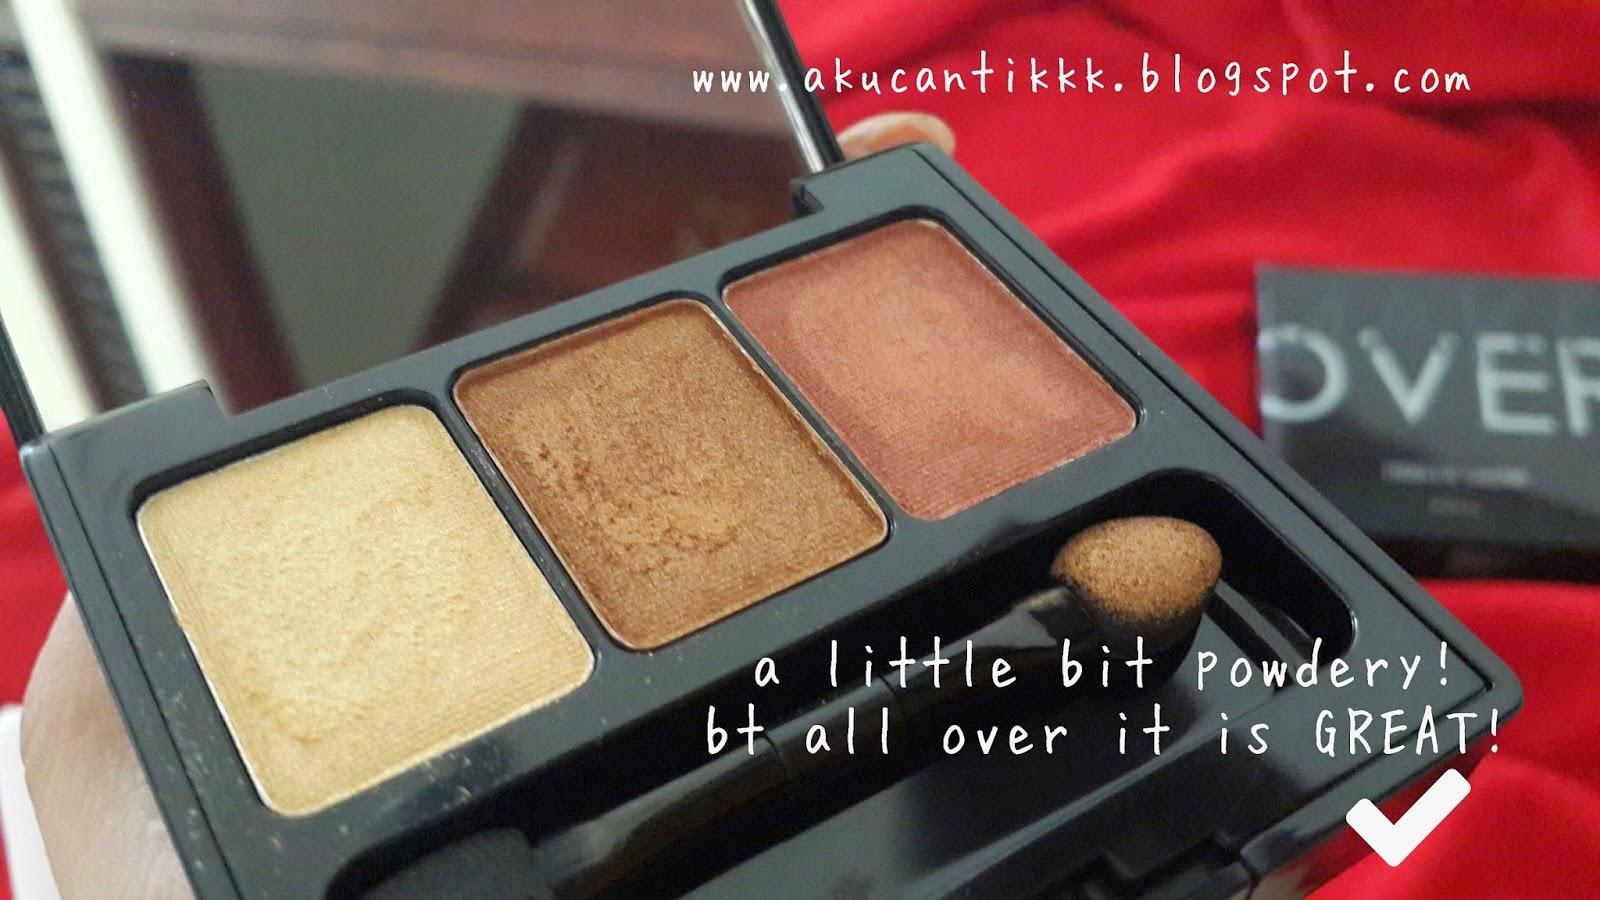 Harga Dan Spesifikasi Make Over Trivia Eye Shadow Termurah 2018 Baju Pria Minion Stuart Koboi Eyeshadow Gold Espress Daftar Terlengkap Makeover Source Malah Aku Kagum